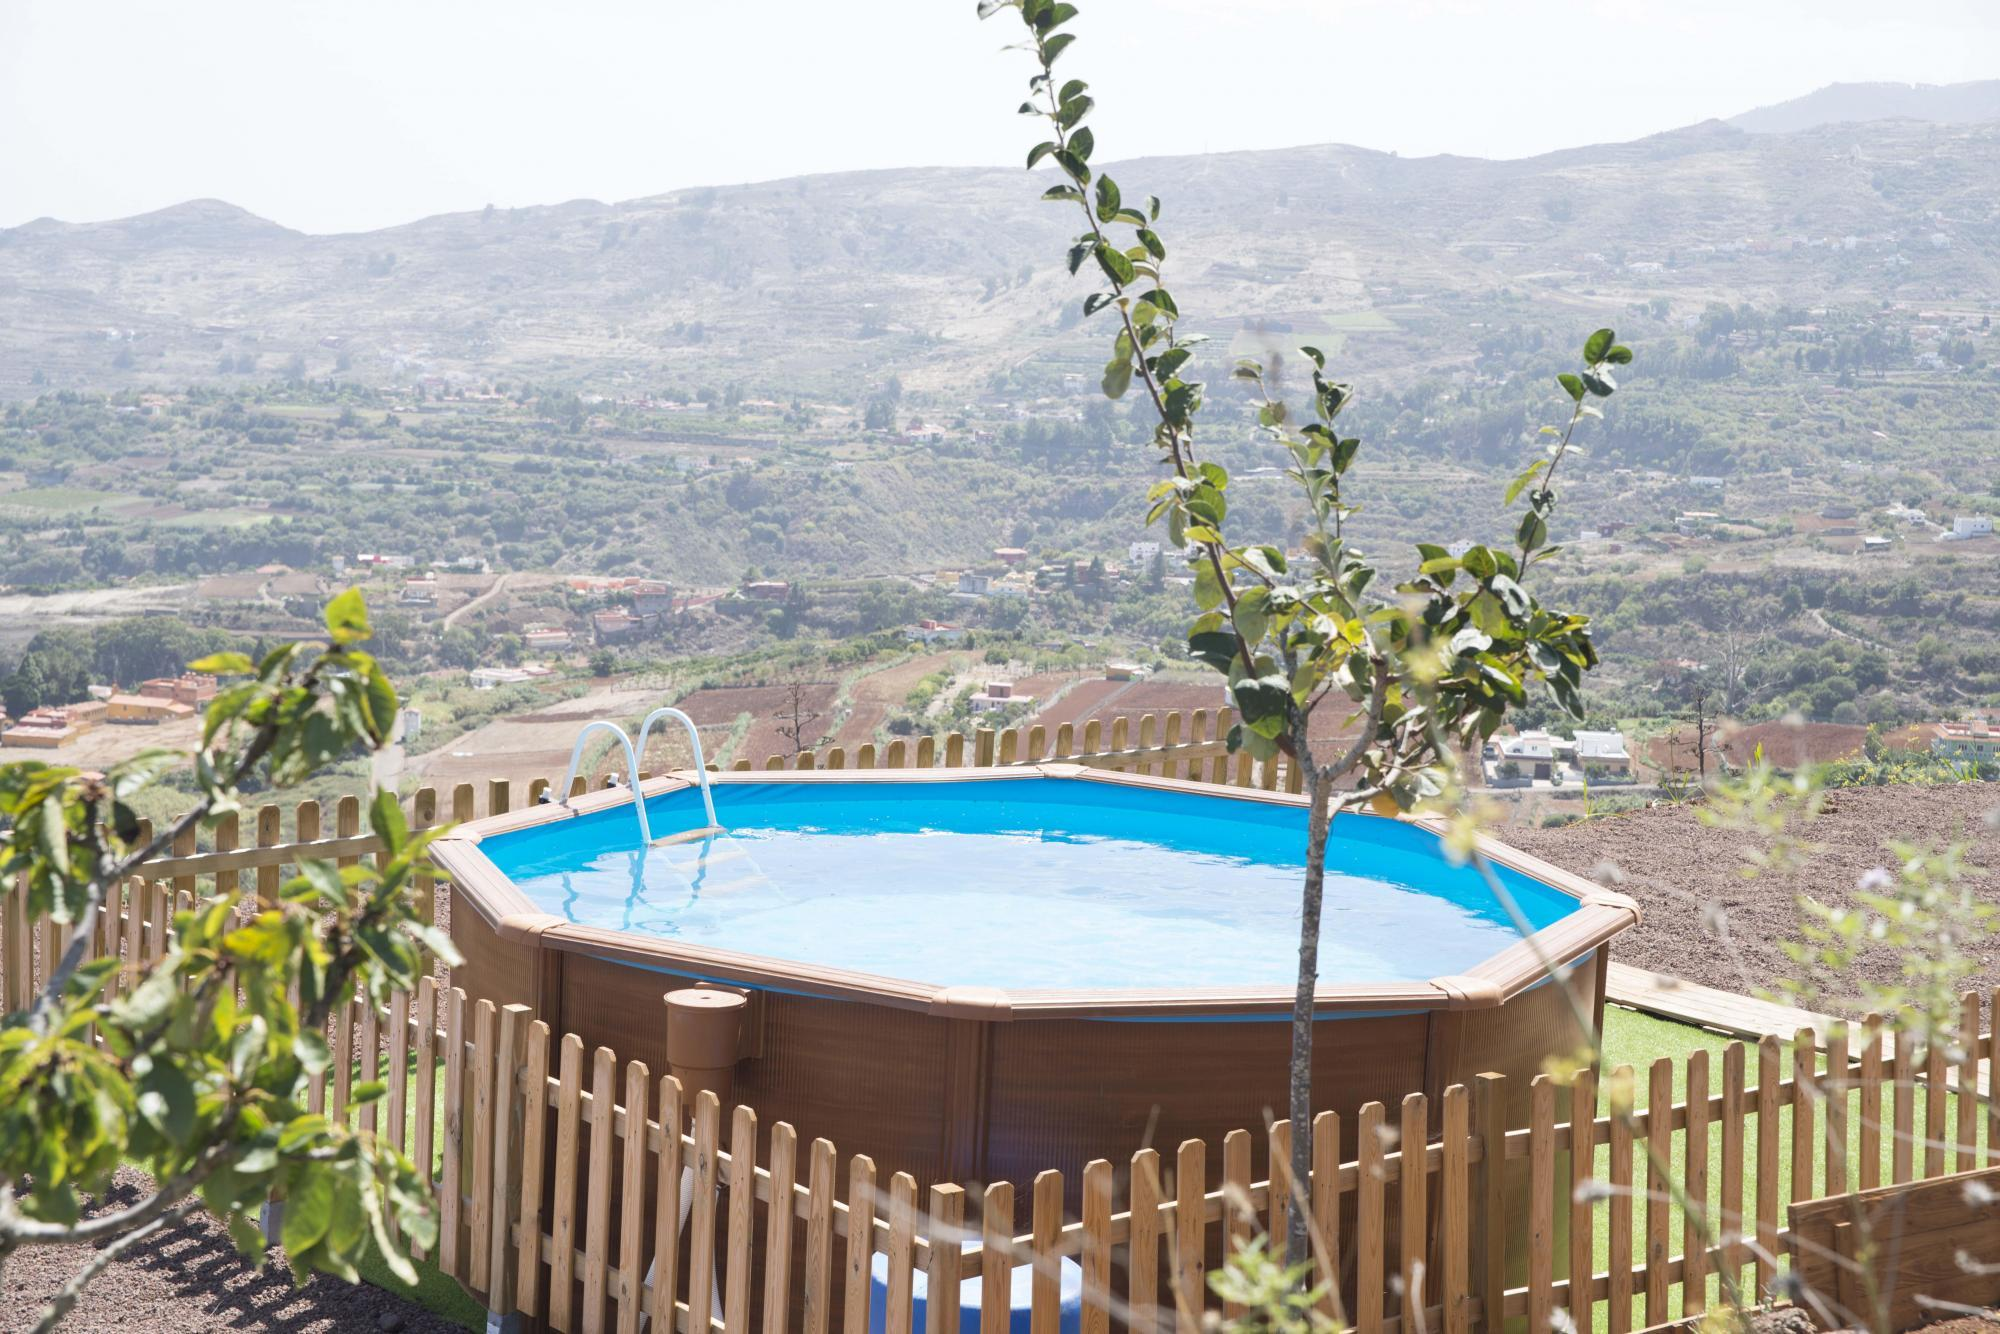 Fotos de casa rural la caldera gran canaria teror for Casa rural gran canaria piscina